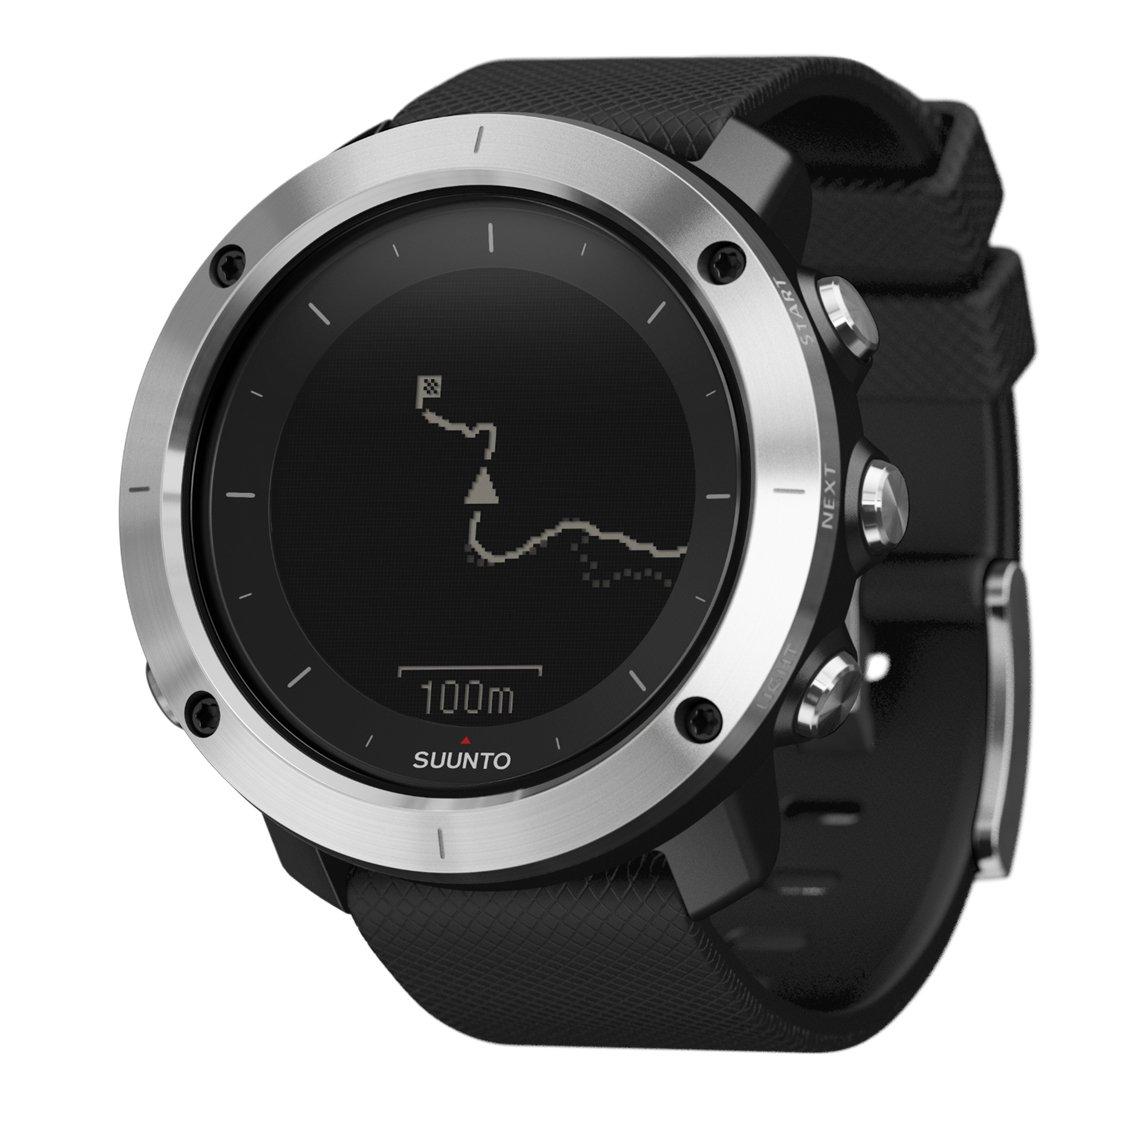 SUUNTO TRAVERSE (スント トラバース) スマートウォッチ GPS 登山 気圧計 [日本正規品] B016N360MO  ブラック